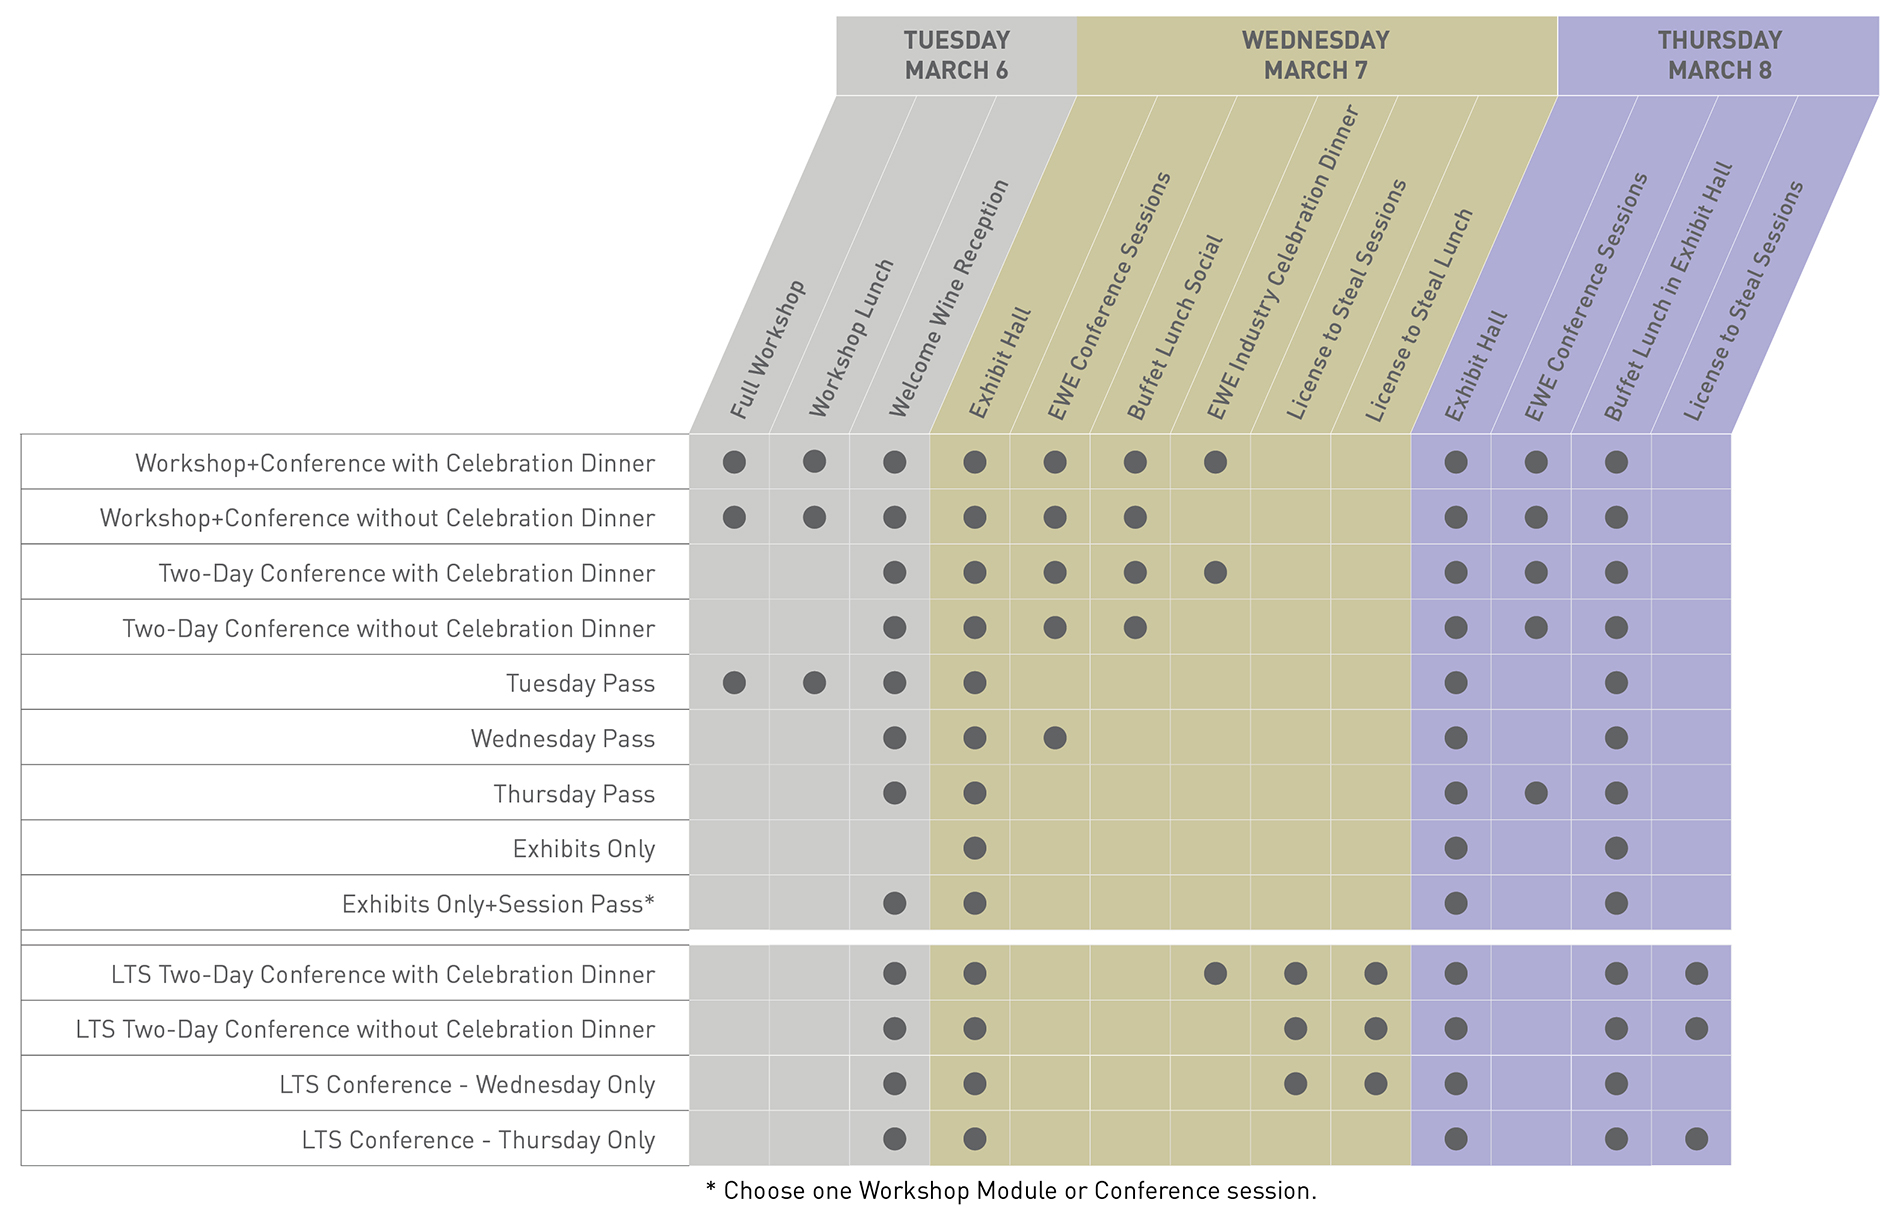 Grid of Registration Options